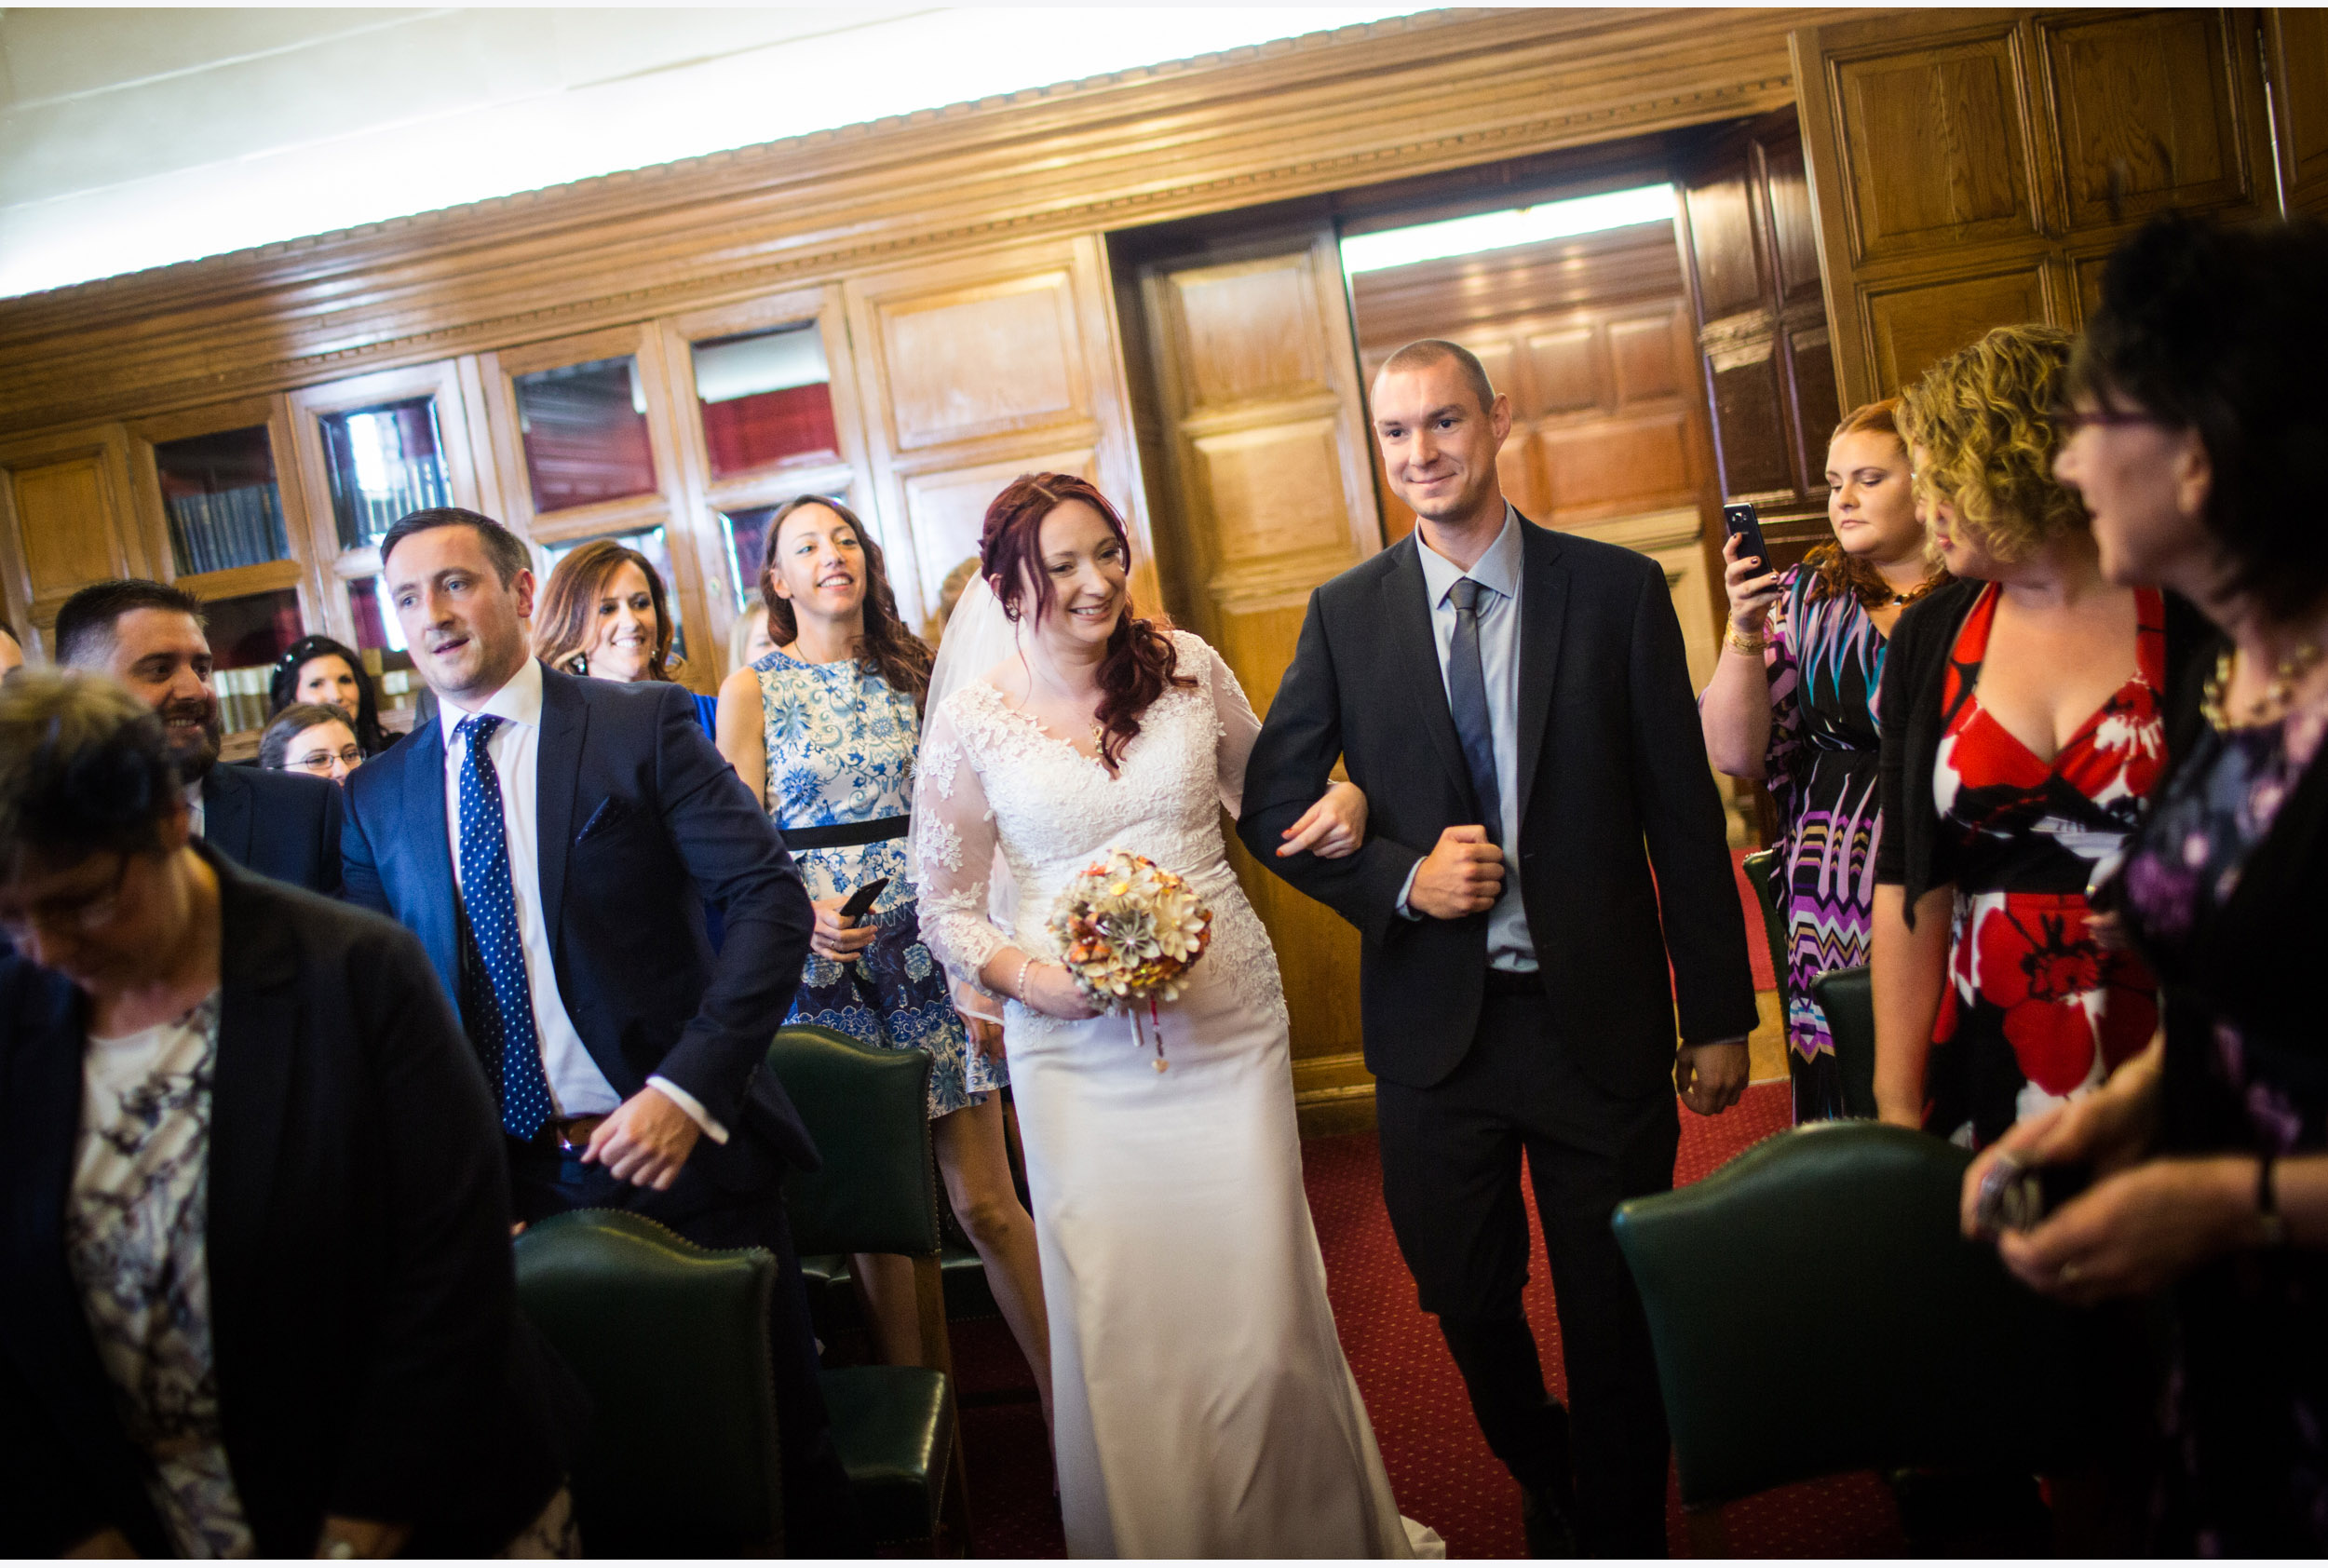 Sonia and David's wedding-7.jpg